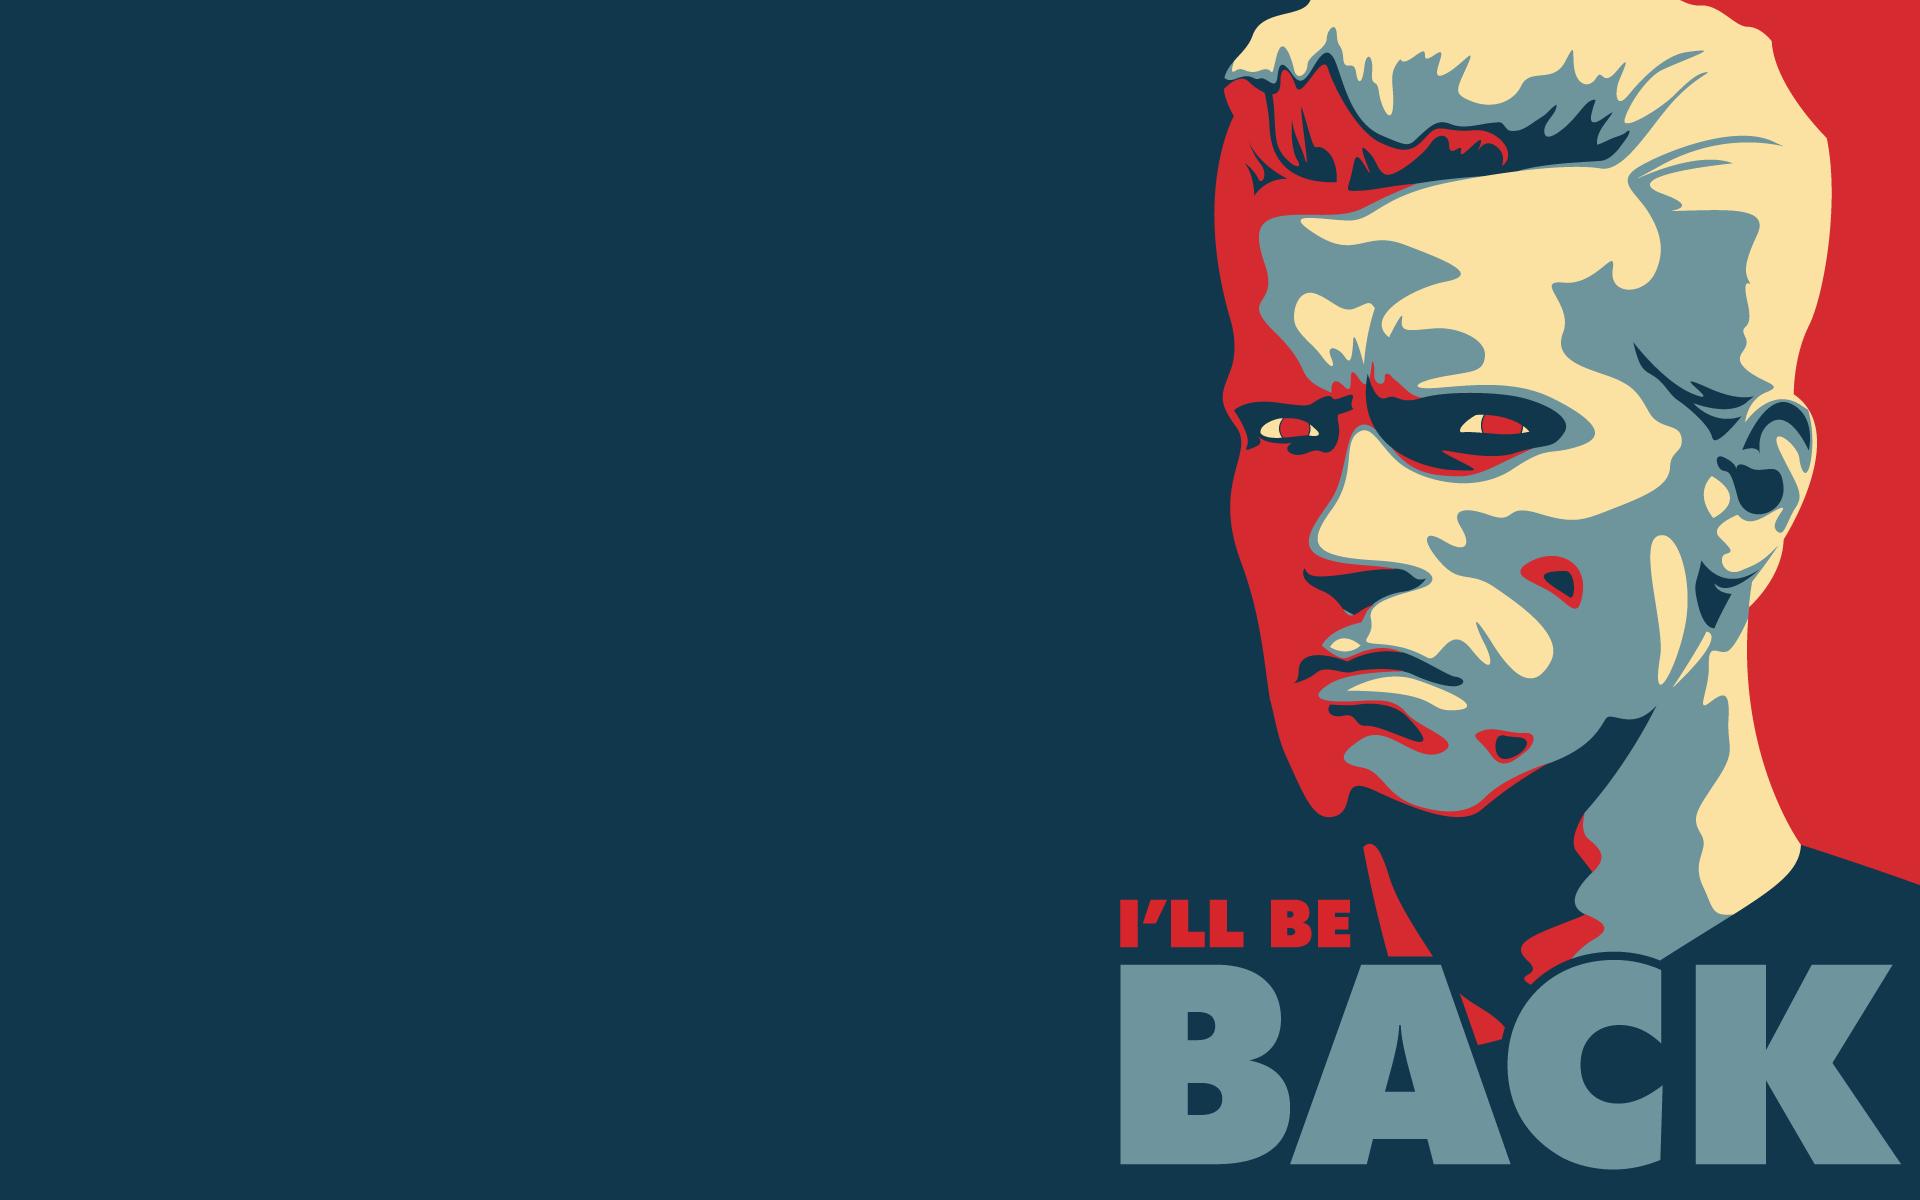 Terminator     wallpaper   Movie wallpapers          Miscellaneoushi com